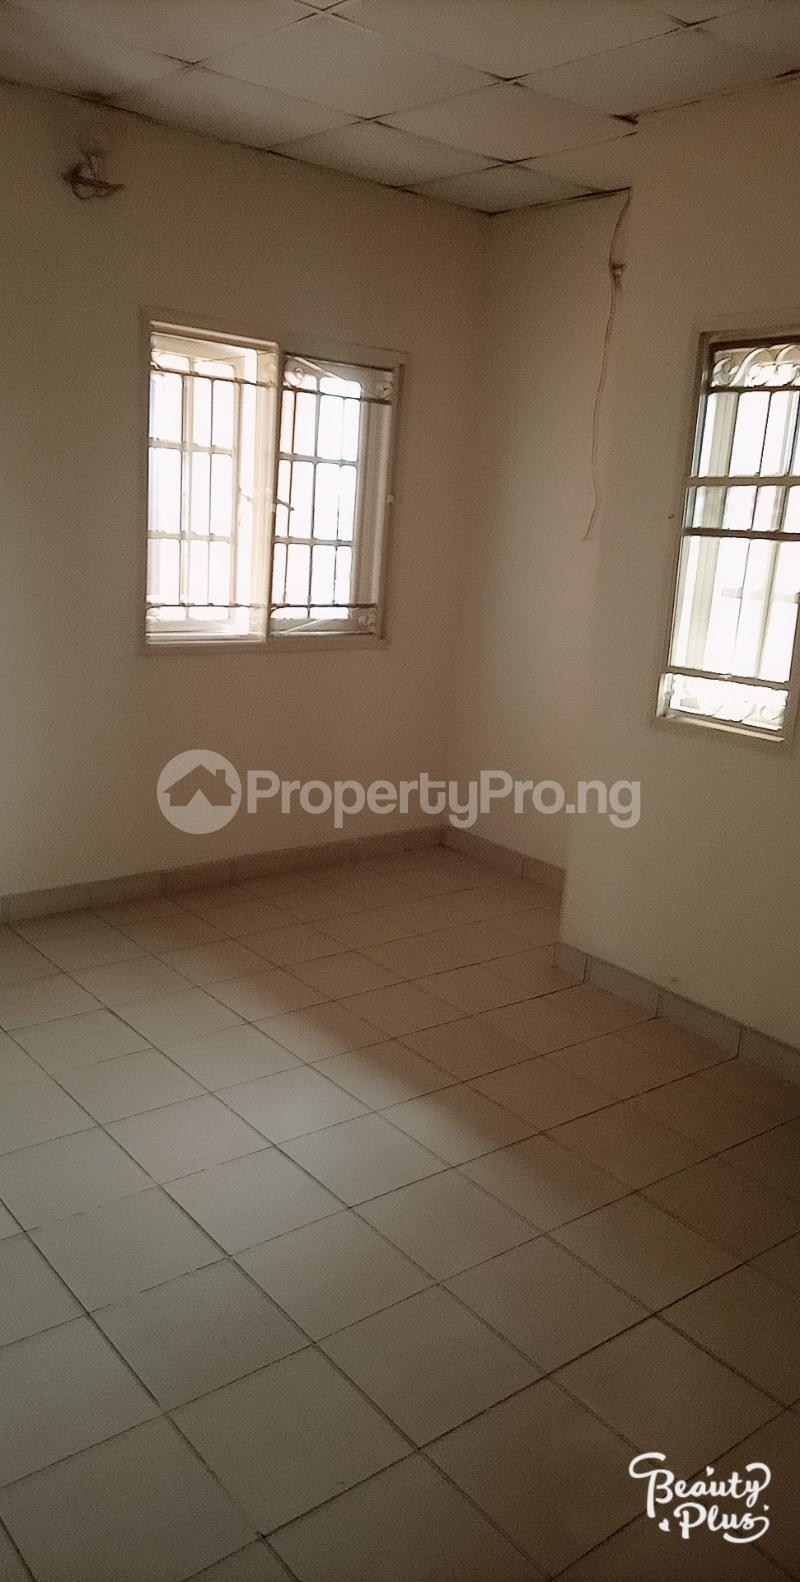 3 bedroom Flat / Apartment for rent Oke Afa isolo. Lagos Mainland Oke-Afa Isolo Lagos - 13